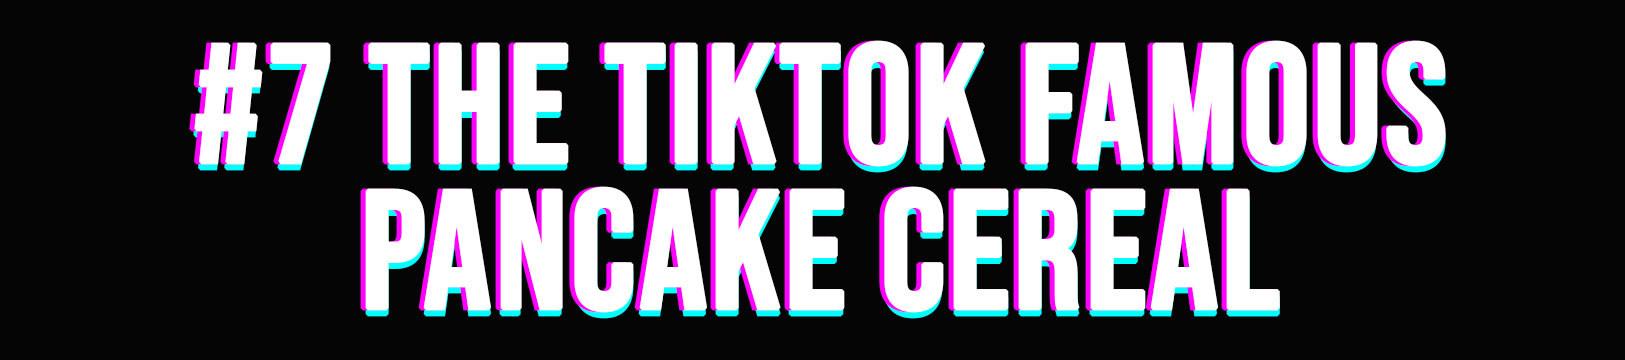 #7 The TikTok Famous Pancake Cereal